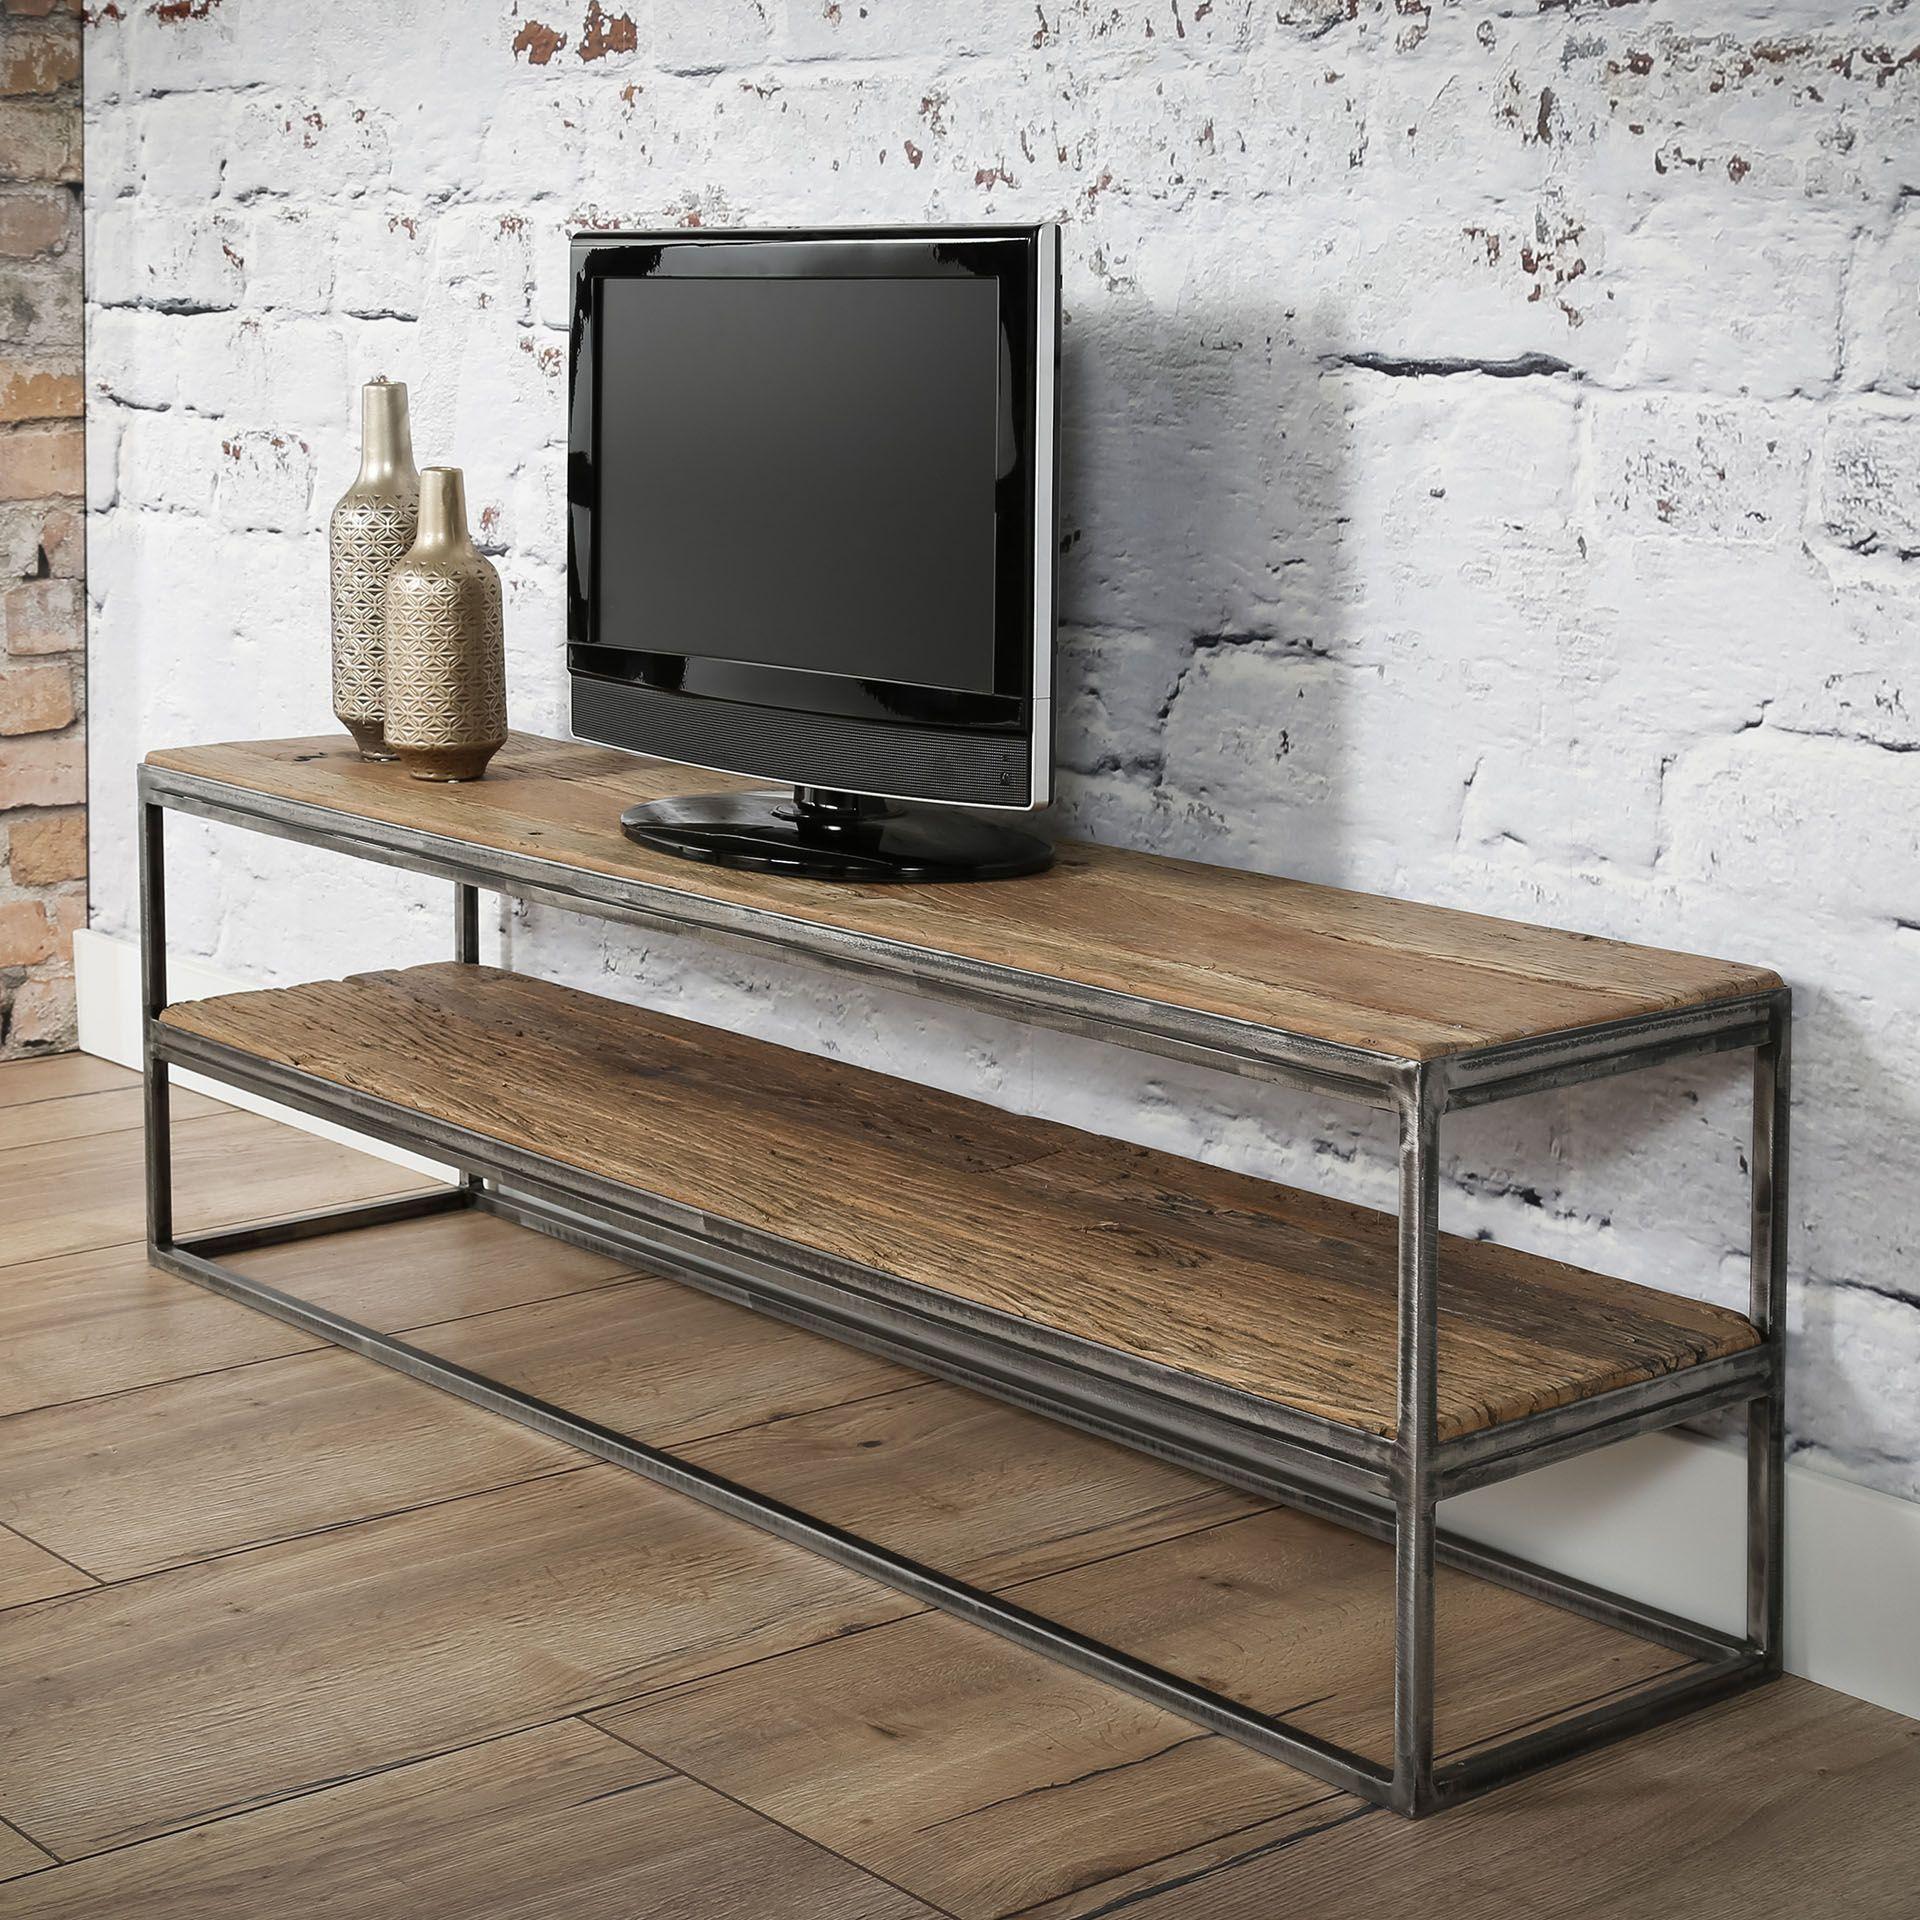 meuble tv bois brut recycle metal omsk